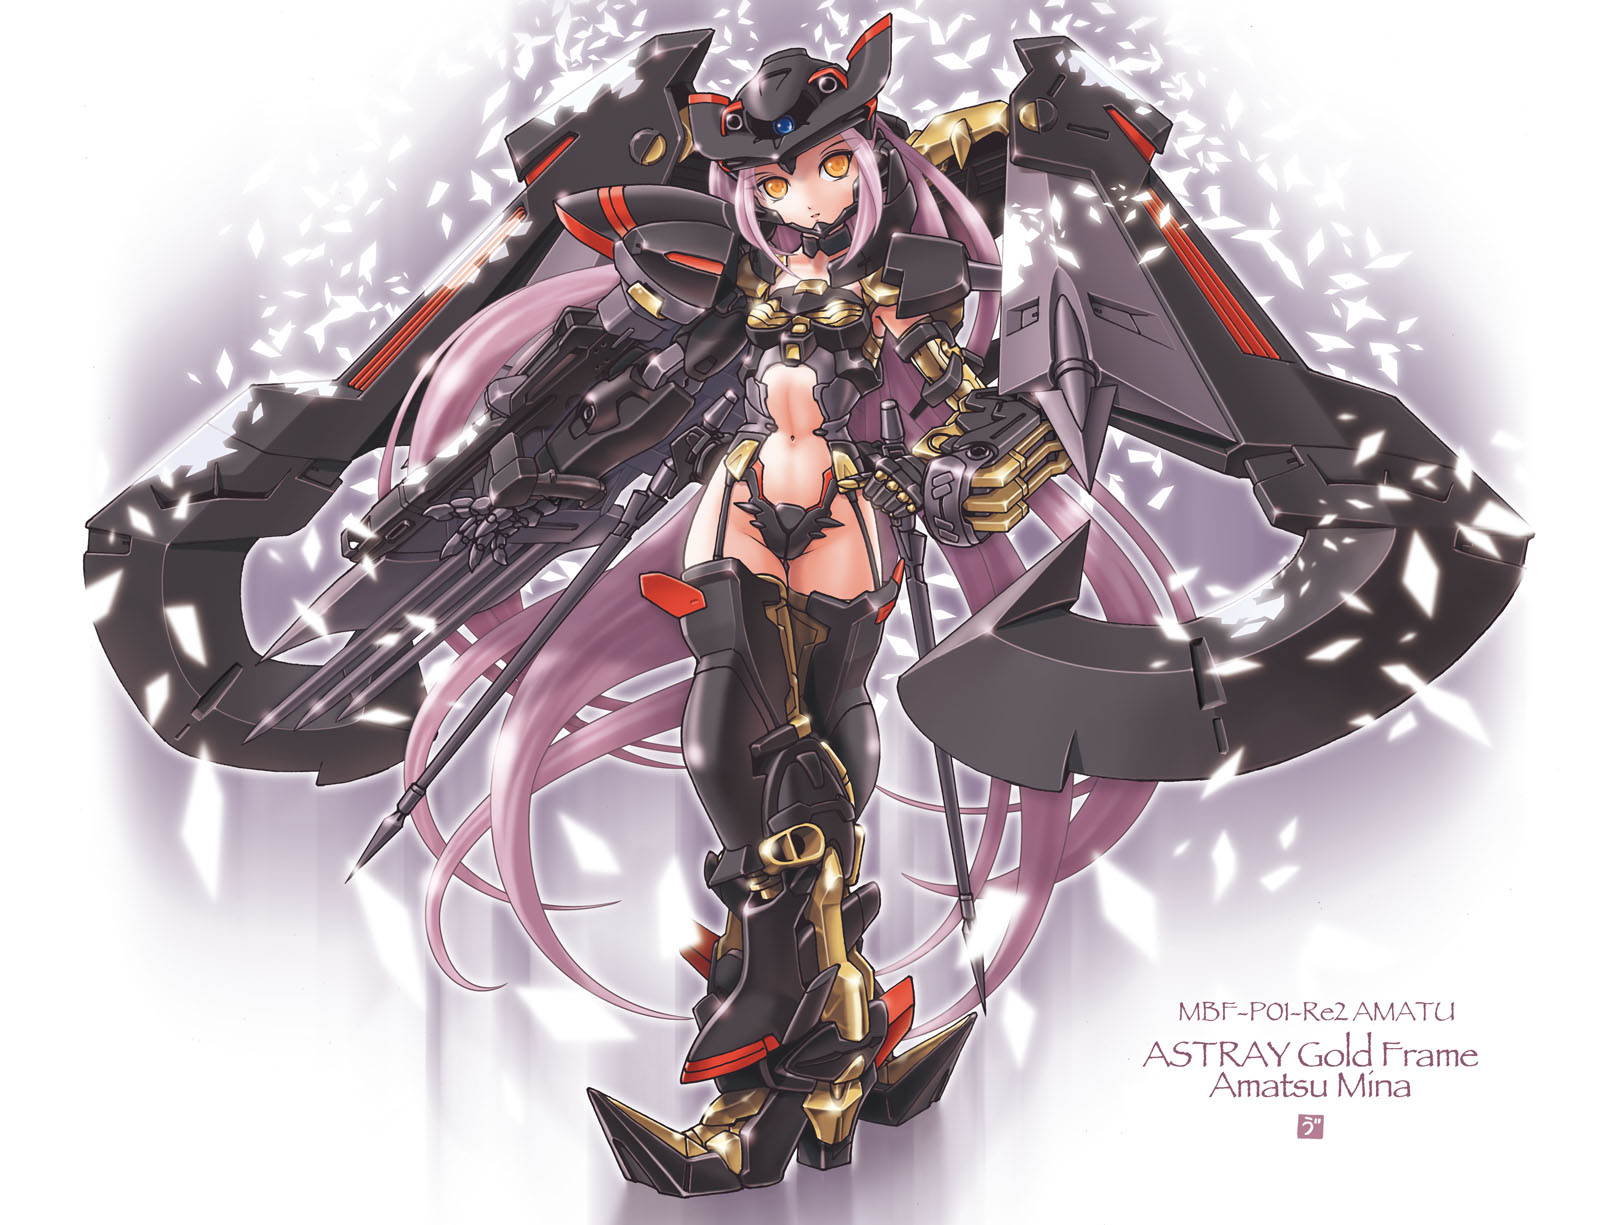 Image - Astray Gold Frame.jpg | The Gundam Wiki | FANDOM powered by ...